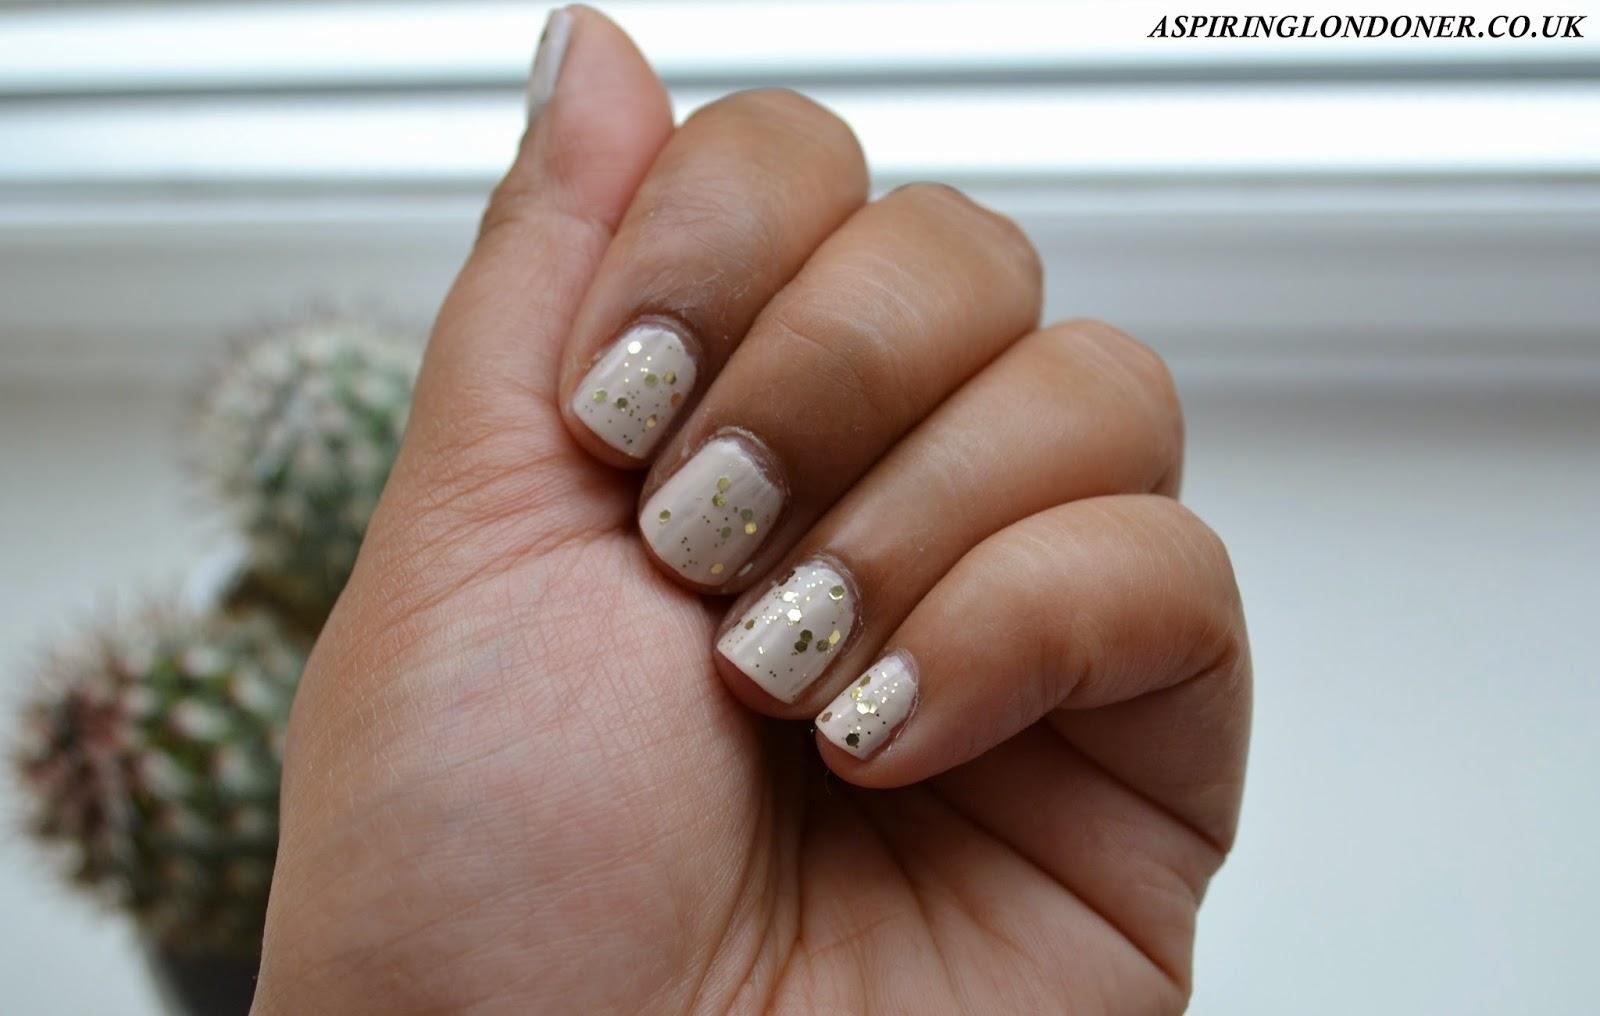 Seventeen Nail Effects Glitter Top Coat Limited Edition - Aspiring Londoner